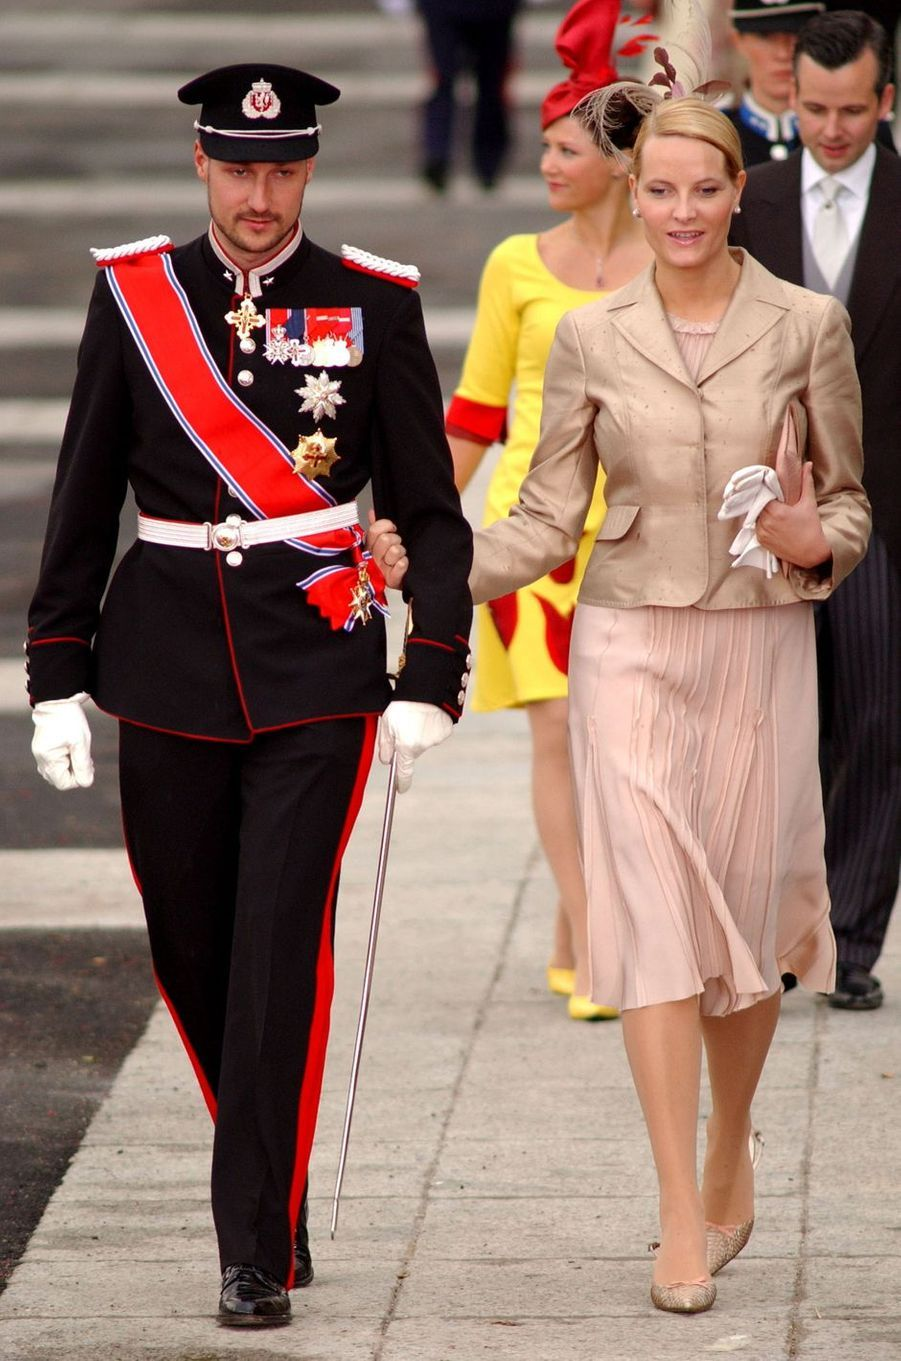 La princesse Mette-Marit et le prince héritier Haakon de Norvège à Madrid, le 22 mai 2004